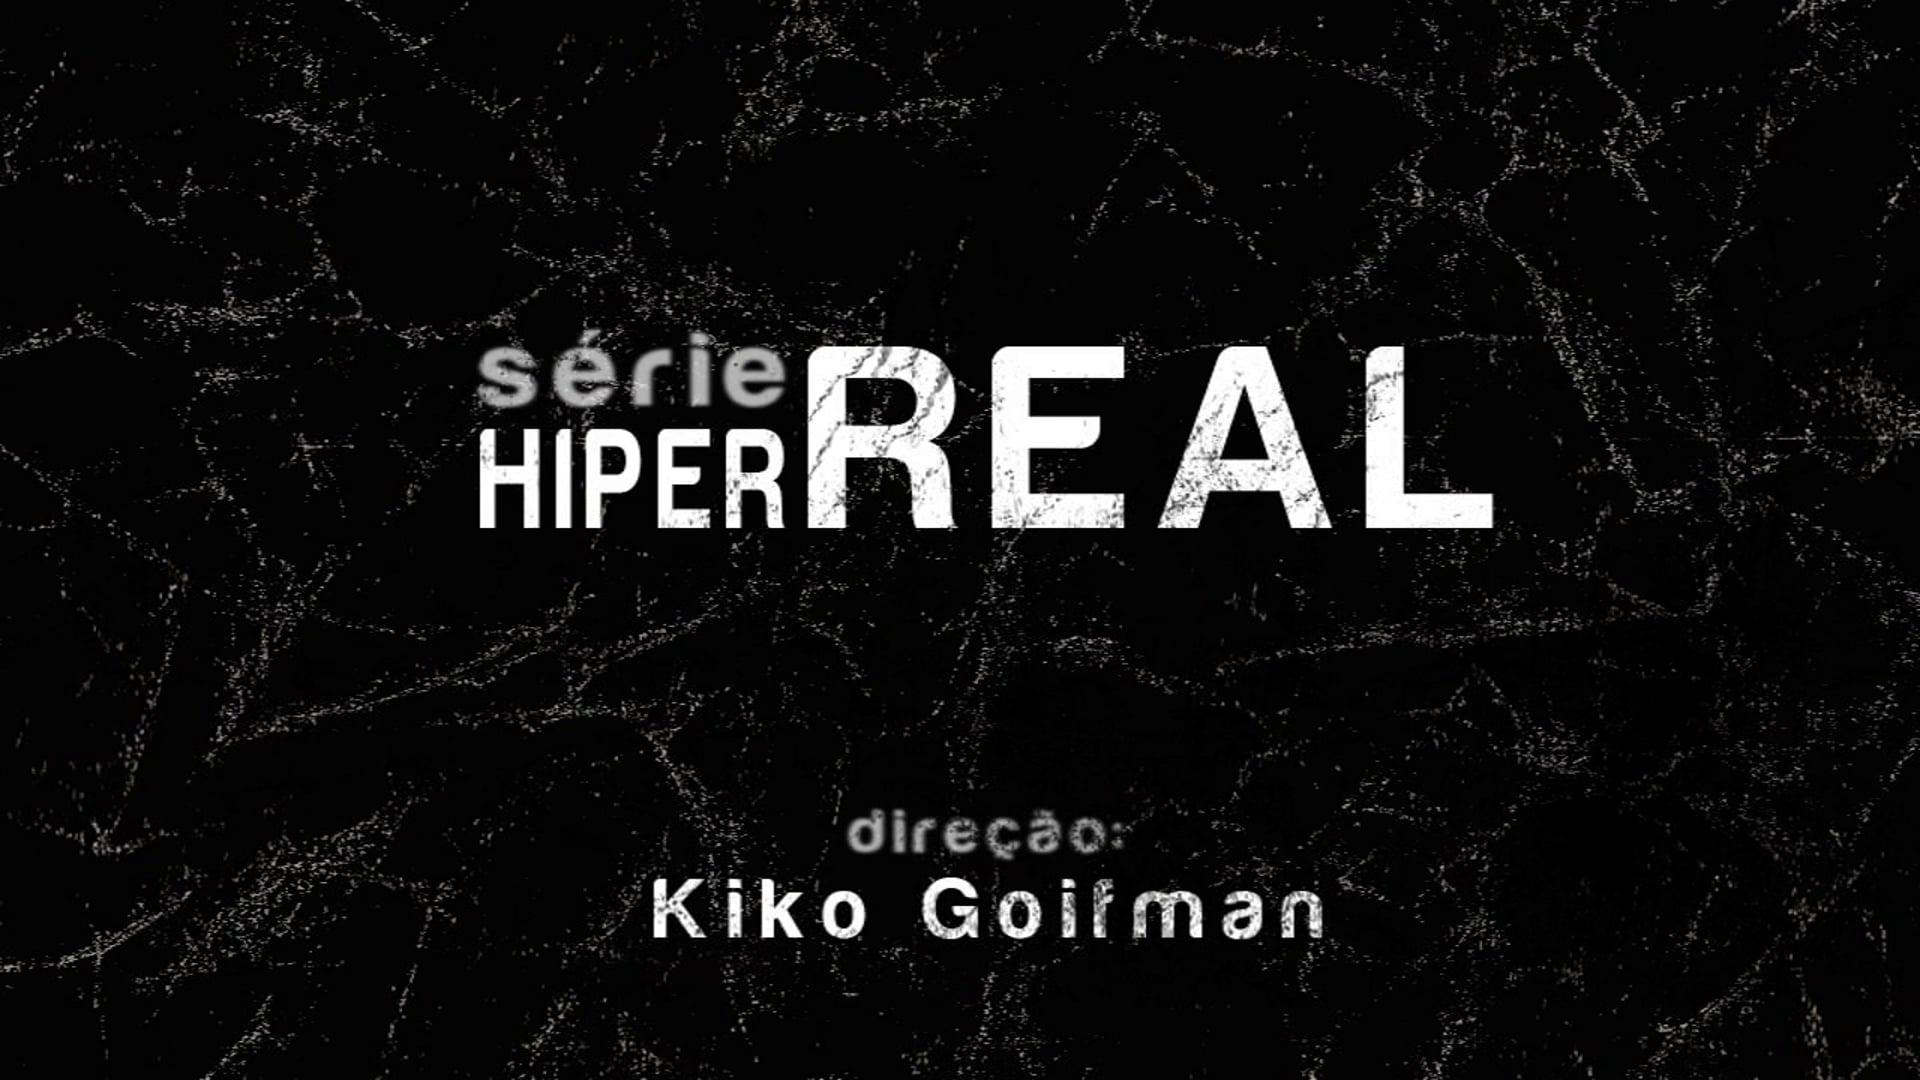 HiperReal - Série de TV - SESCTV